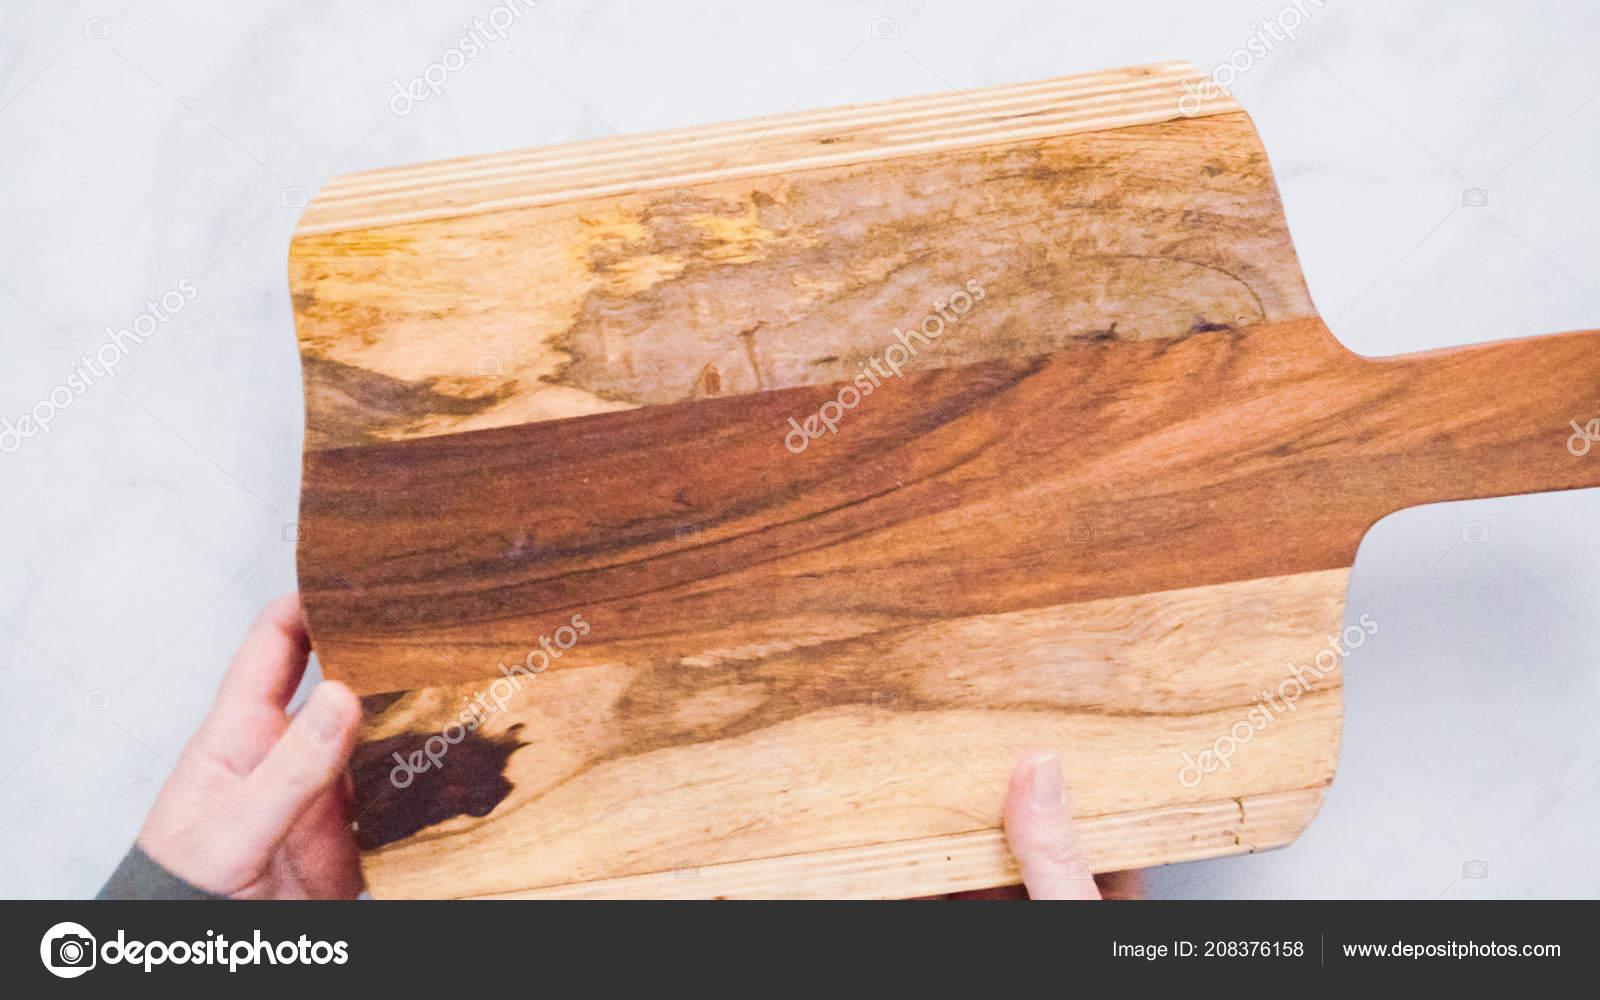 Rustikale Holz Schneidebrett Auf Marmor Kuchenarbeitsplatte